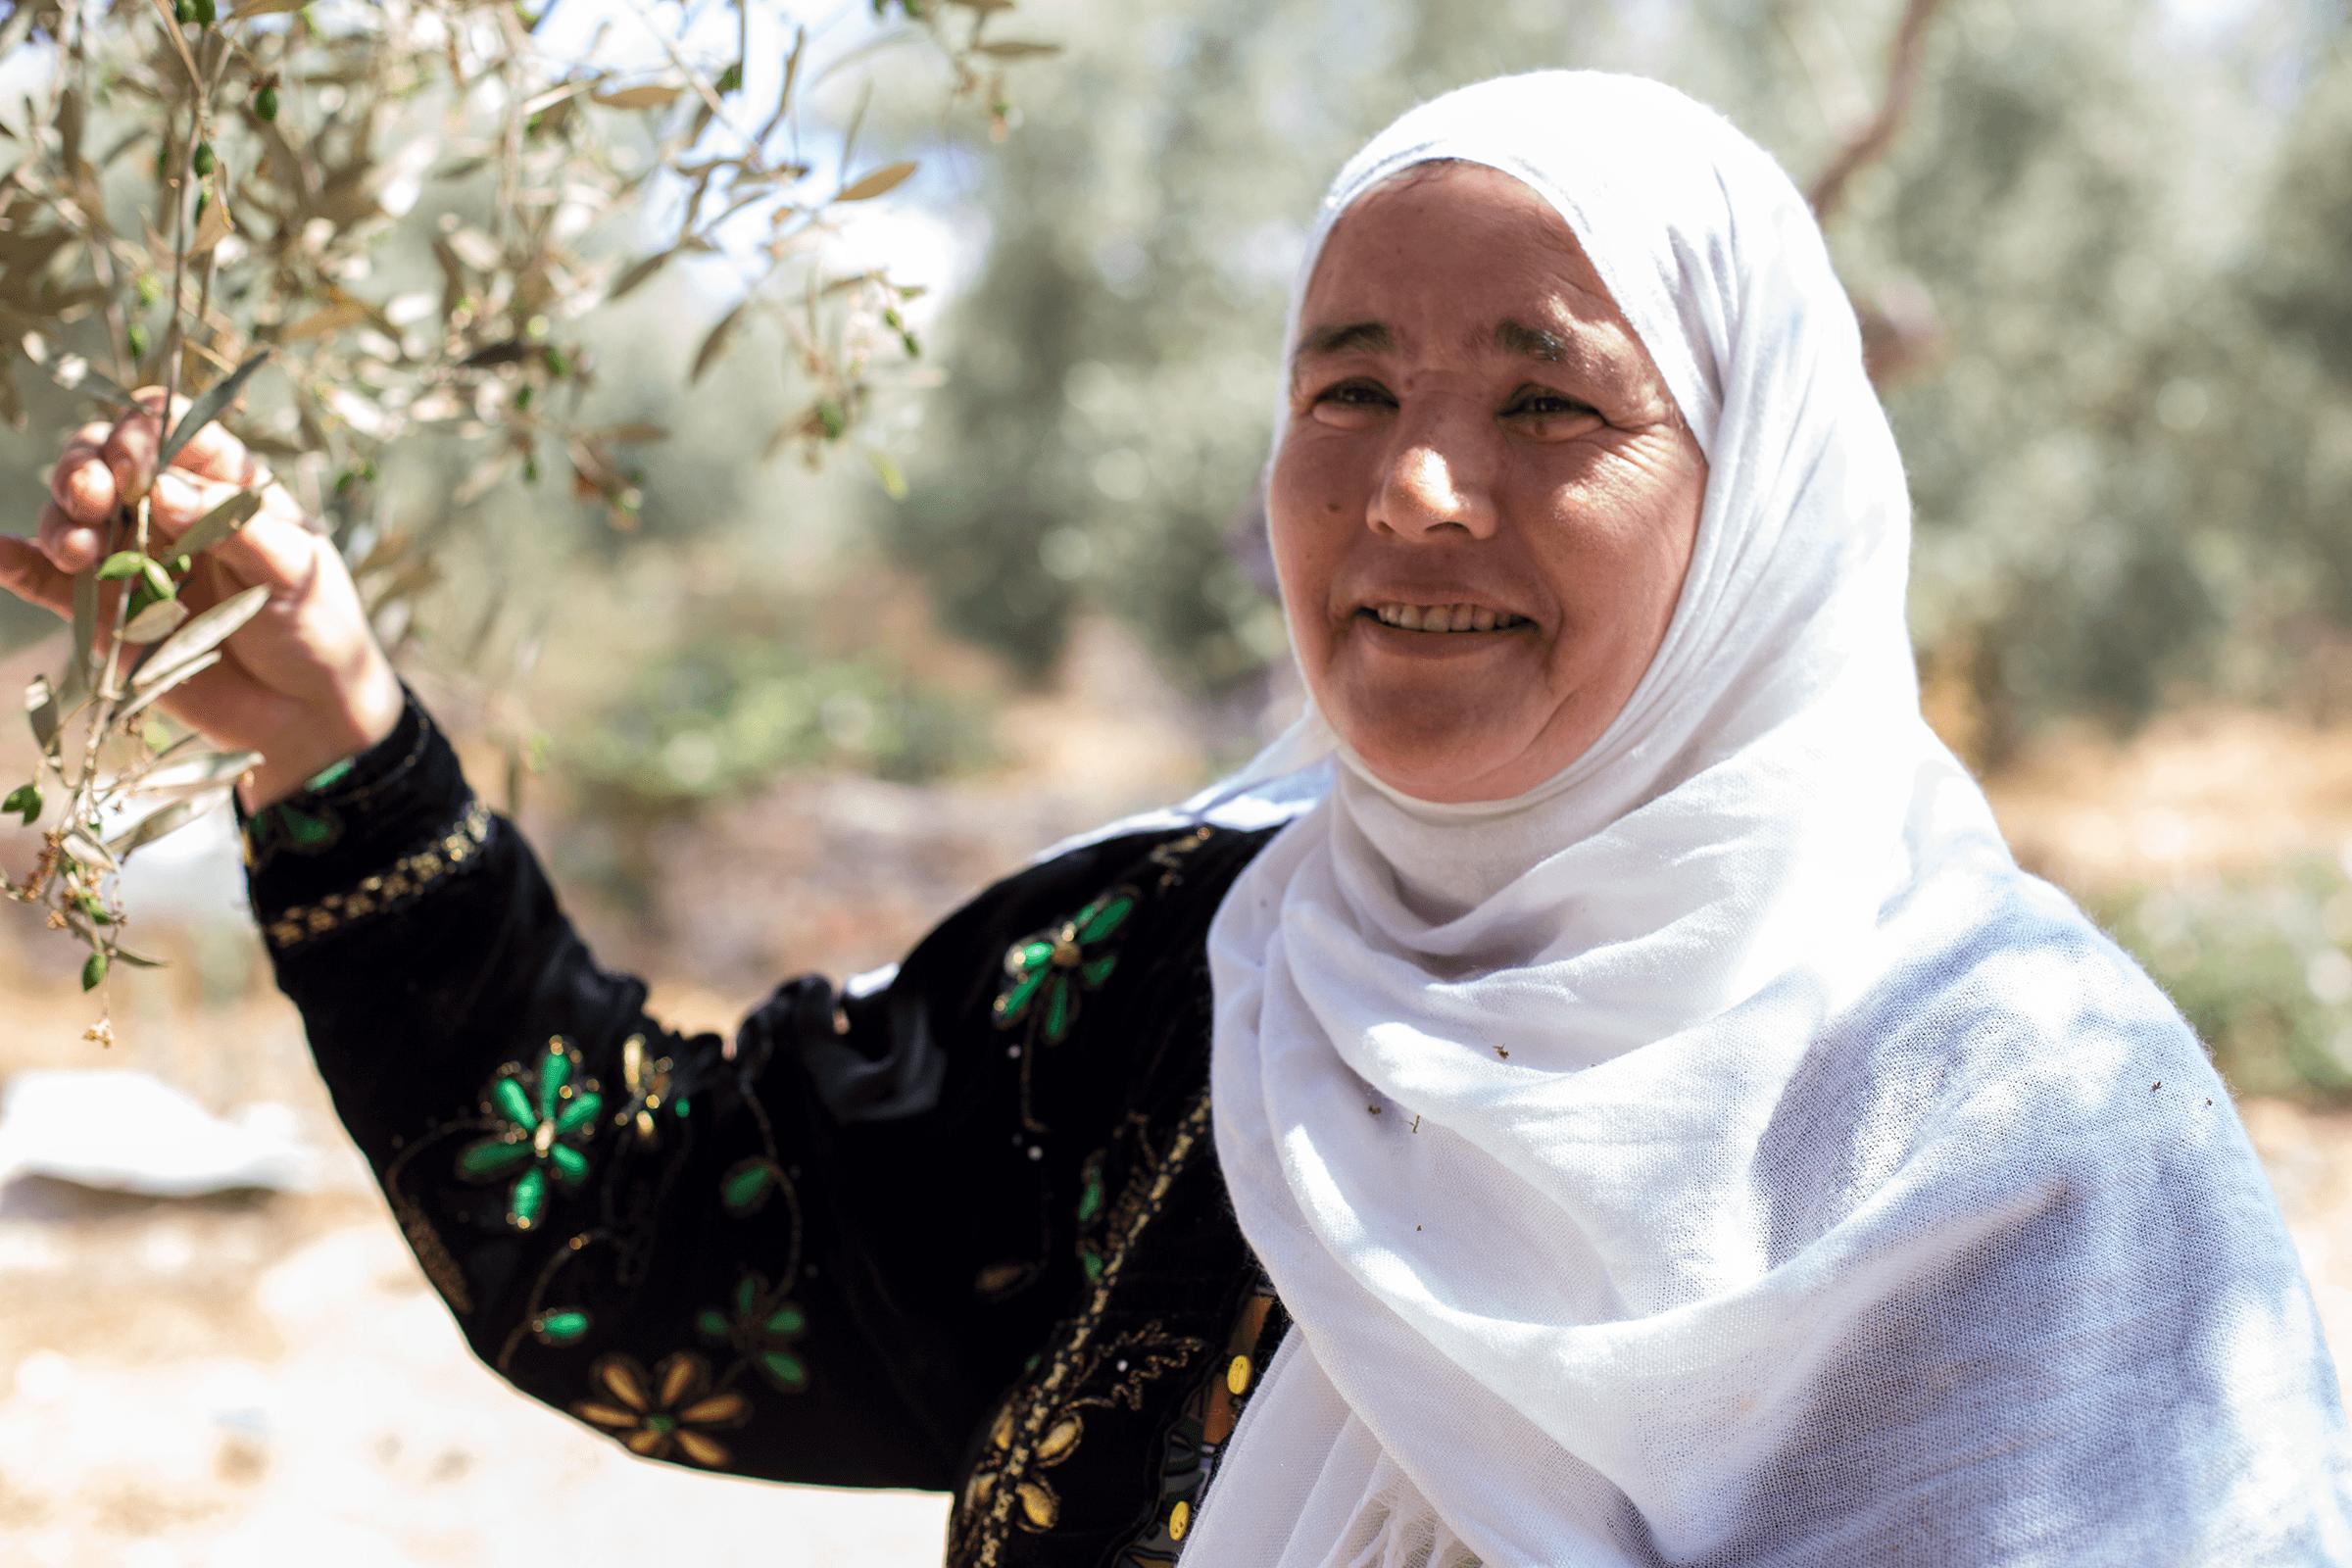 2015_Palestine_Newhouse Media_Myasar Yseen_25